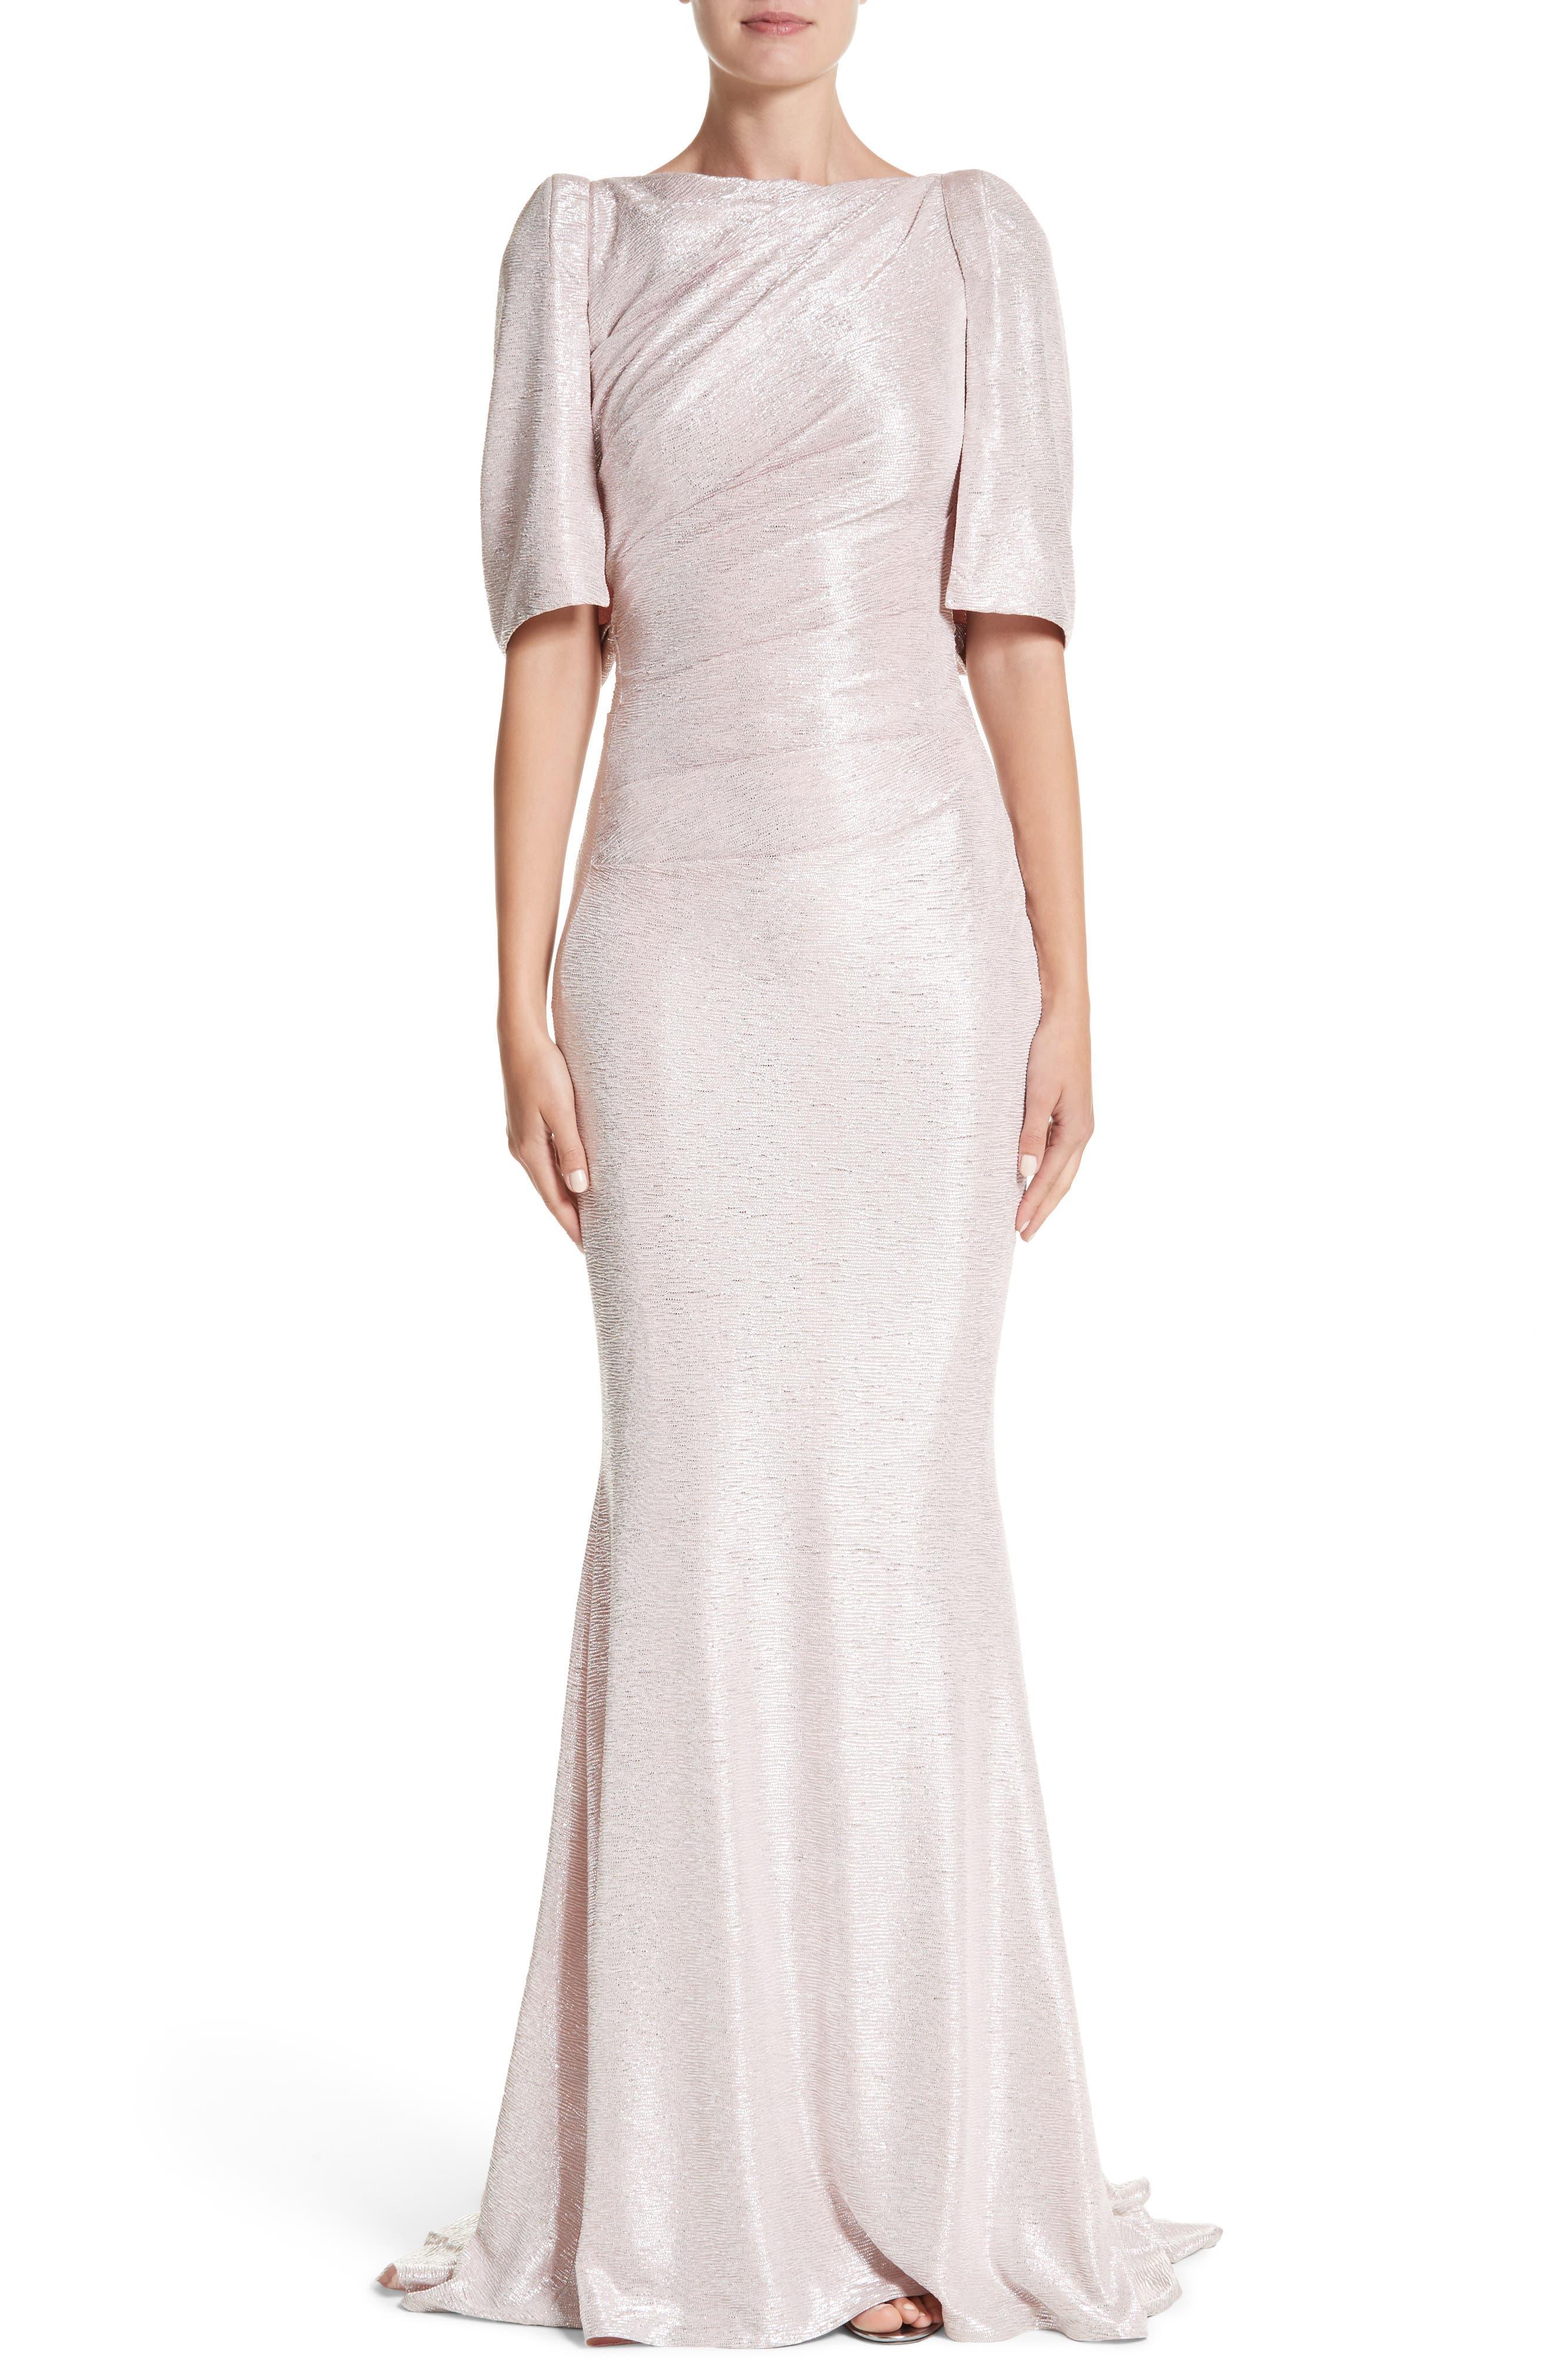 Main Image - Talbot Runhof Metallic Cloqué Mermaid Gown